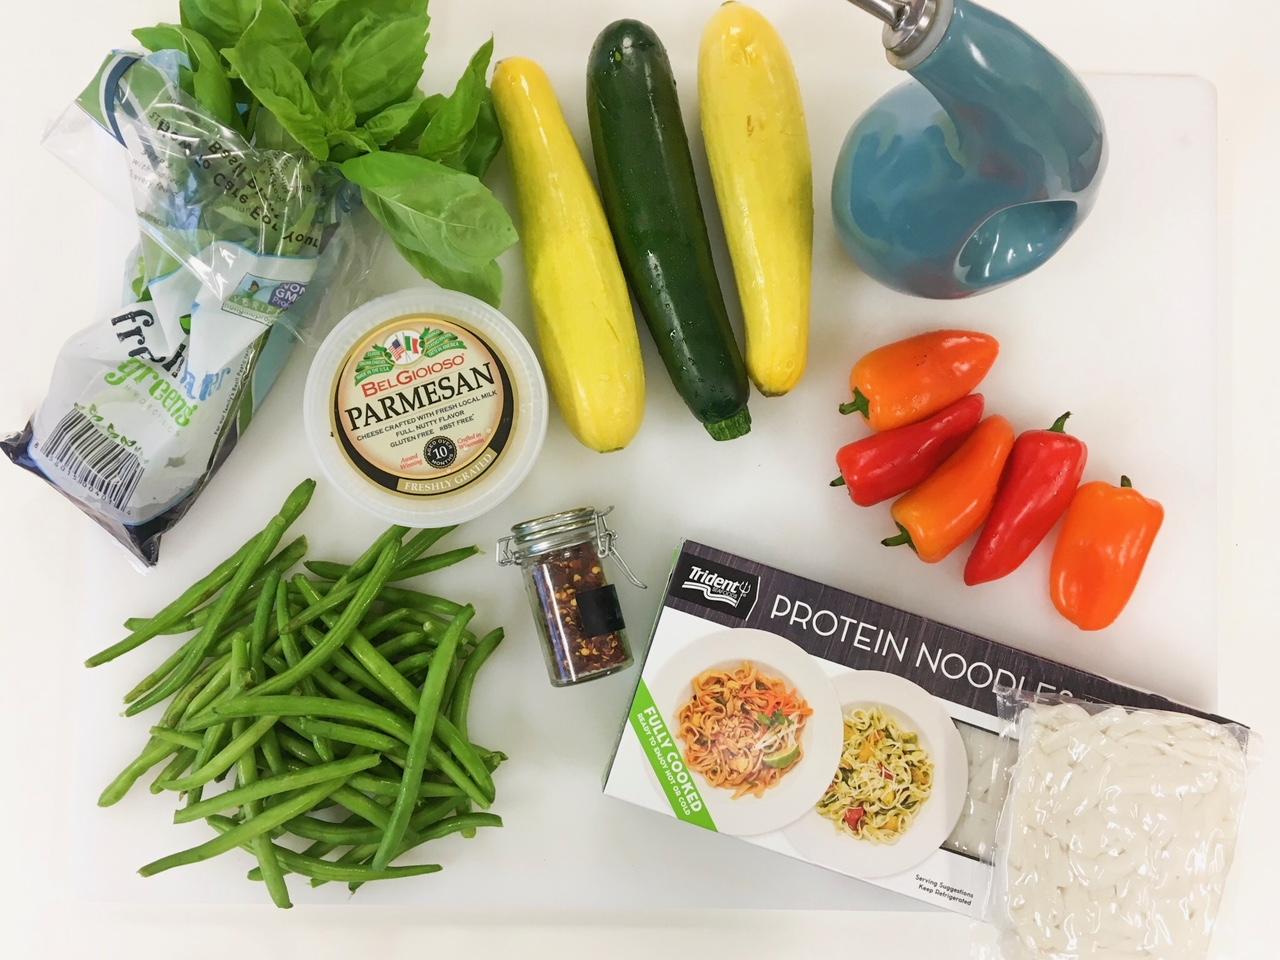 WATCH: Urner Barry Staff Tries Trident Seafoods Wild Alaska Pollock Protein Noodles